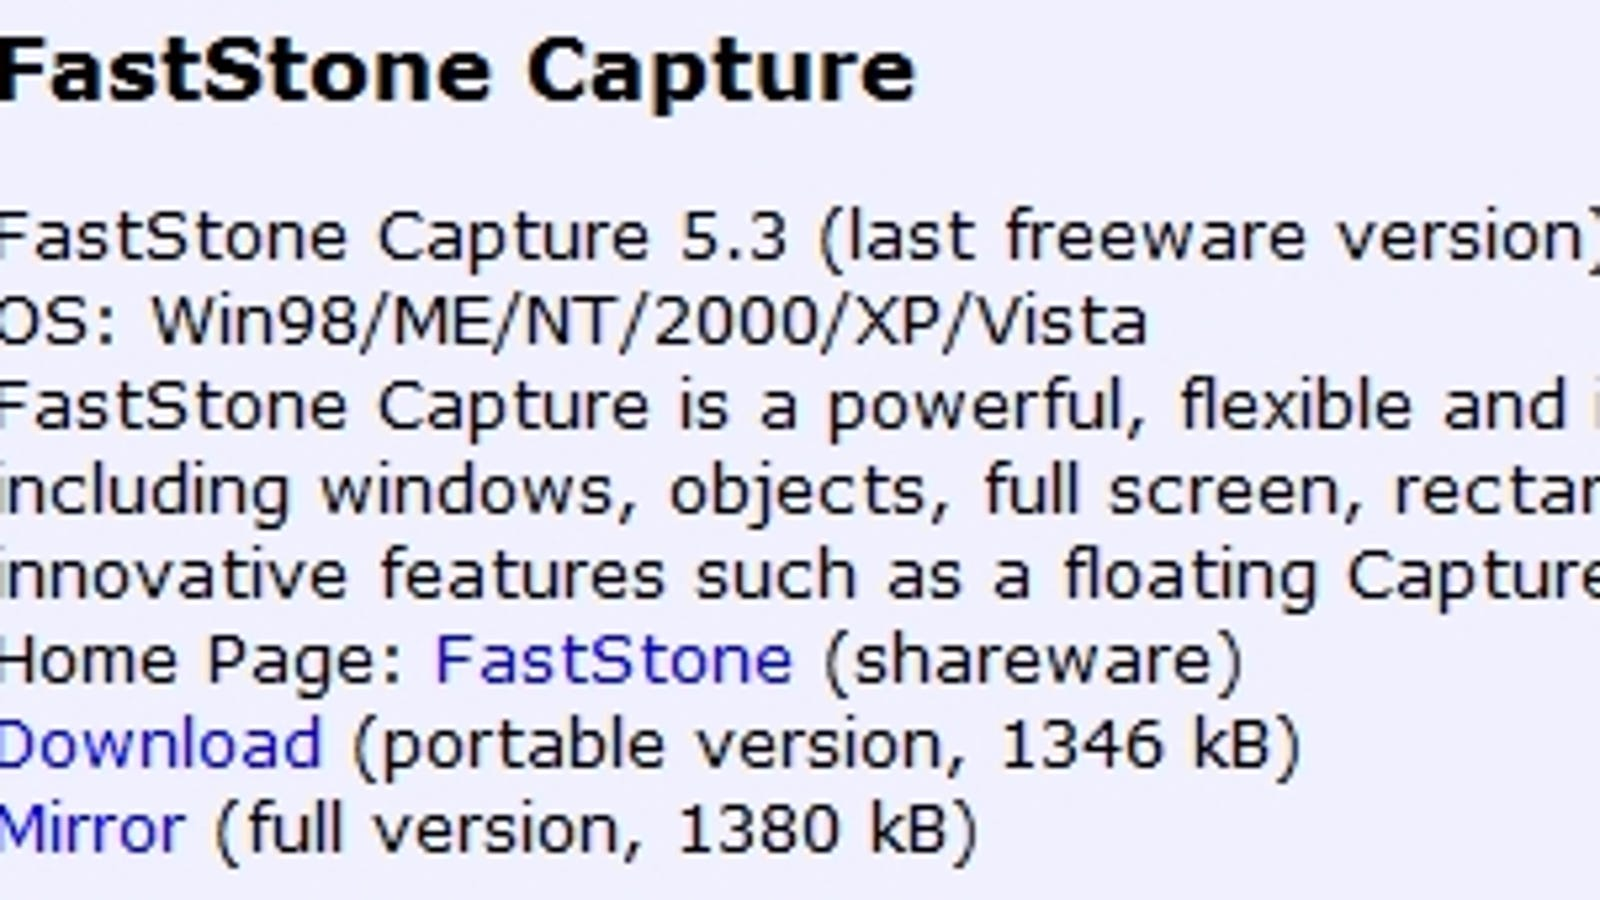 fs capture freeware